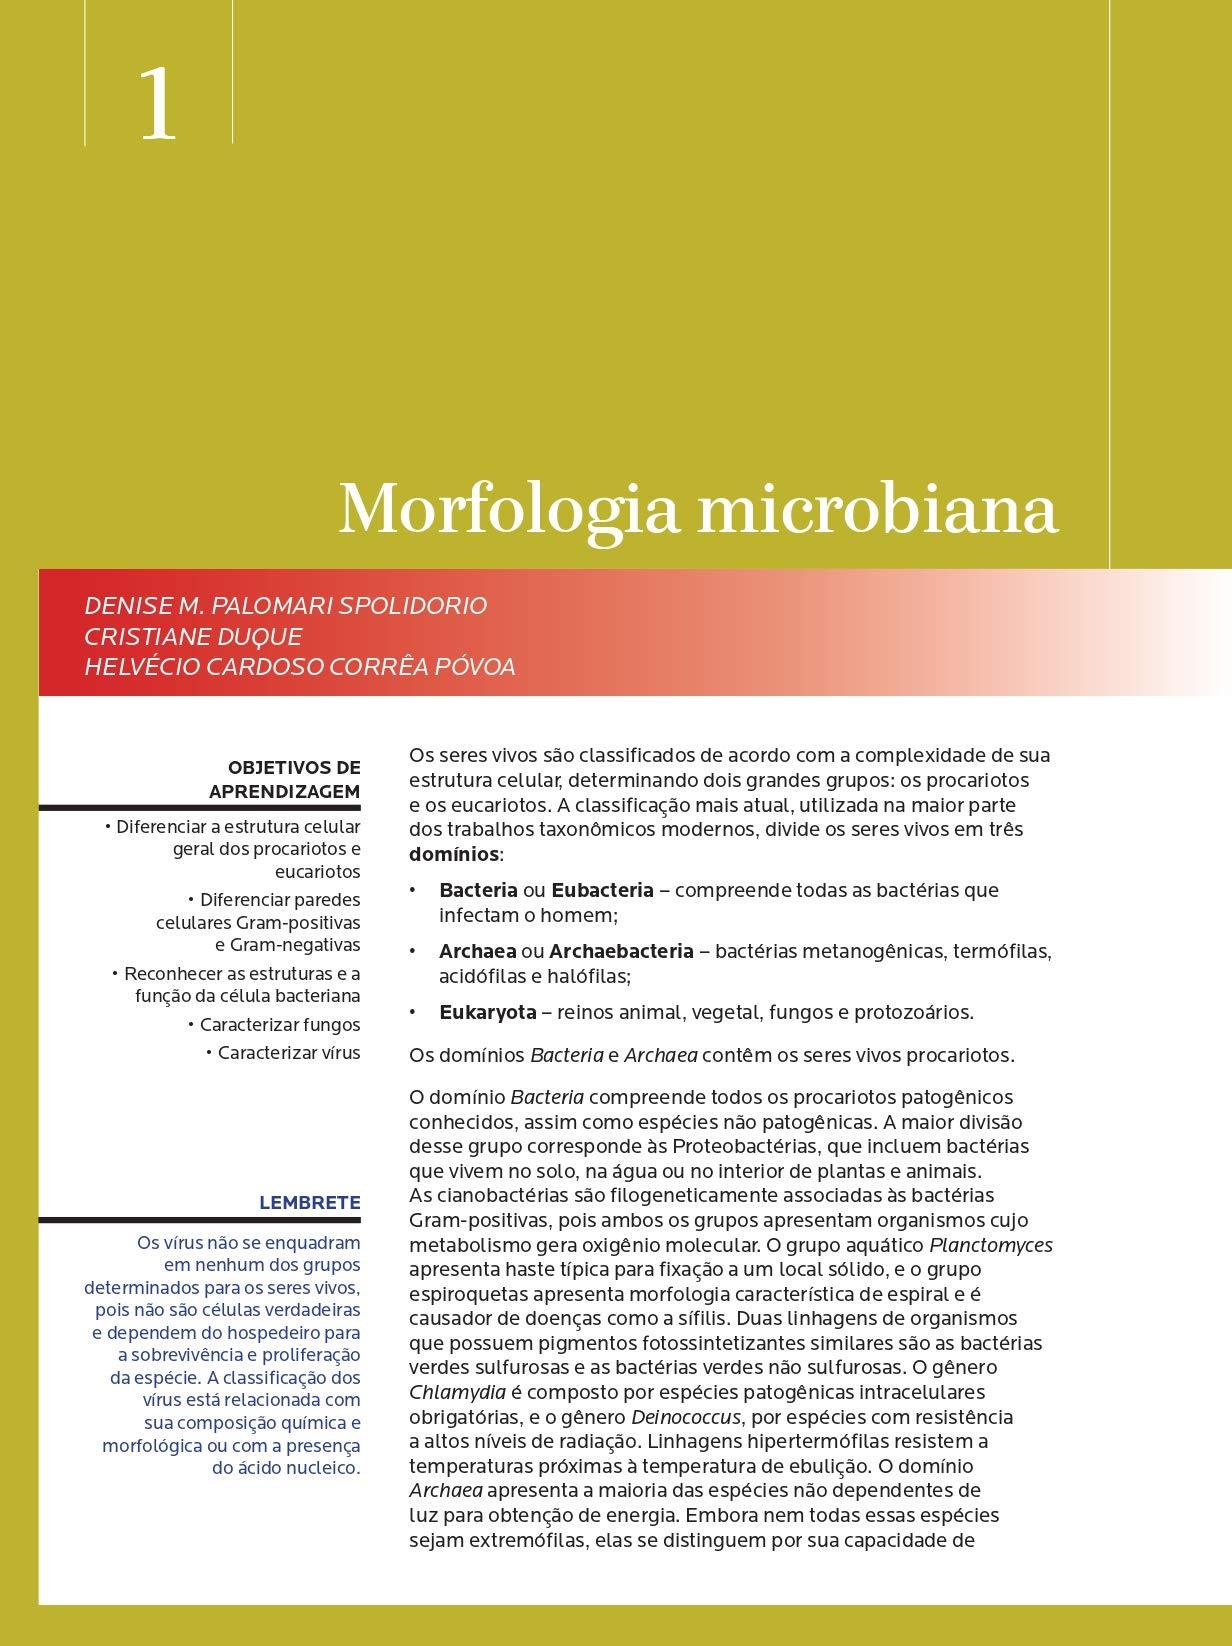 Microbiologia E Imunologia Geral E Odontologica. Abeno 7 ...